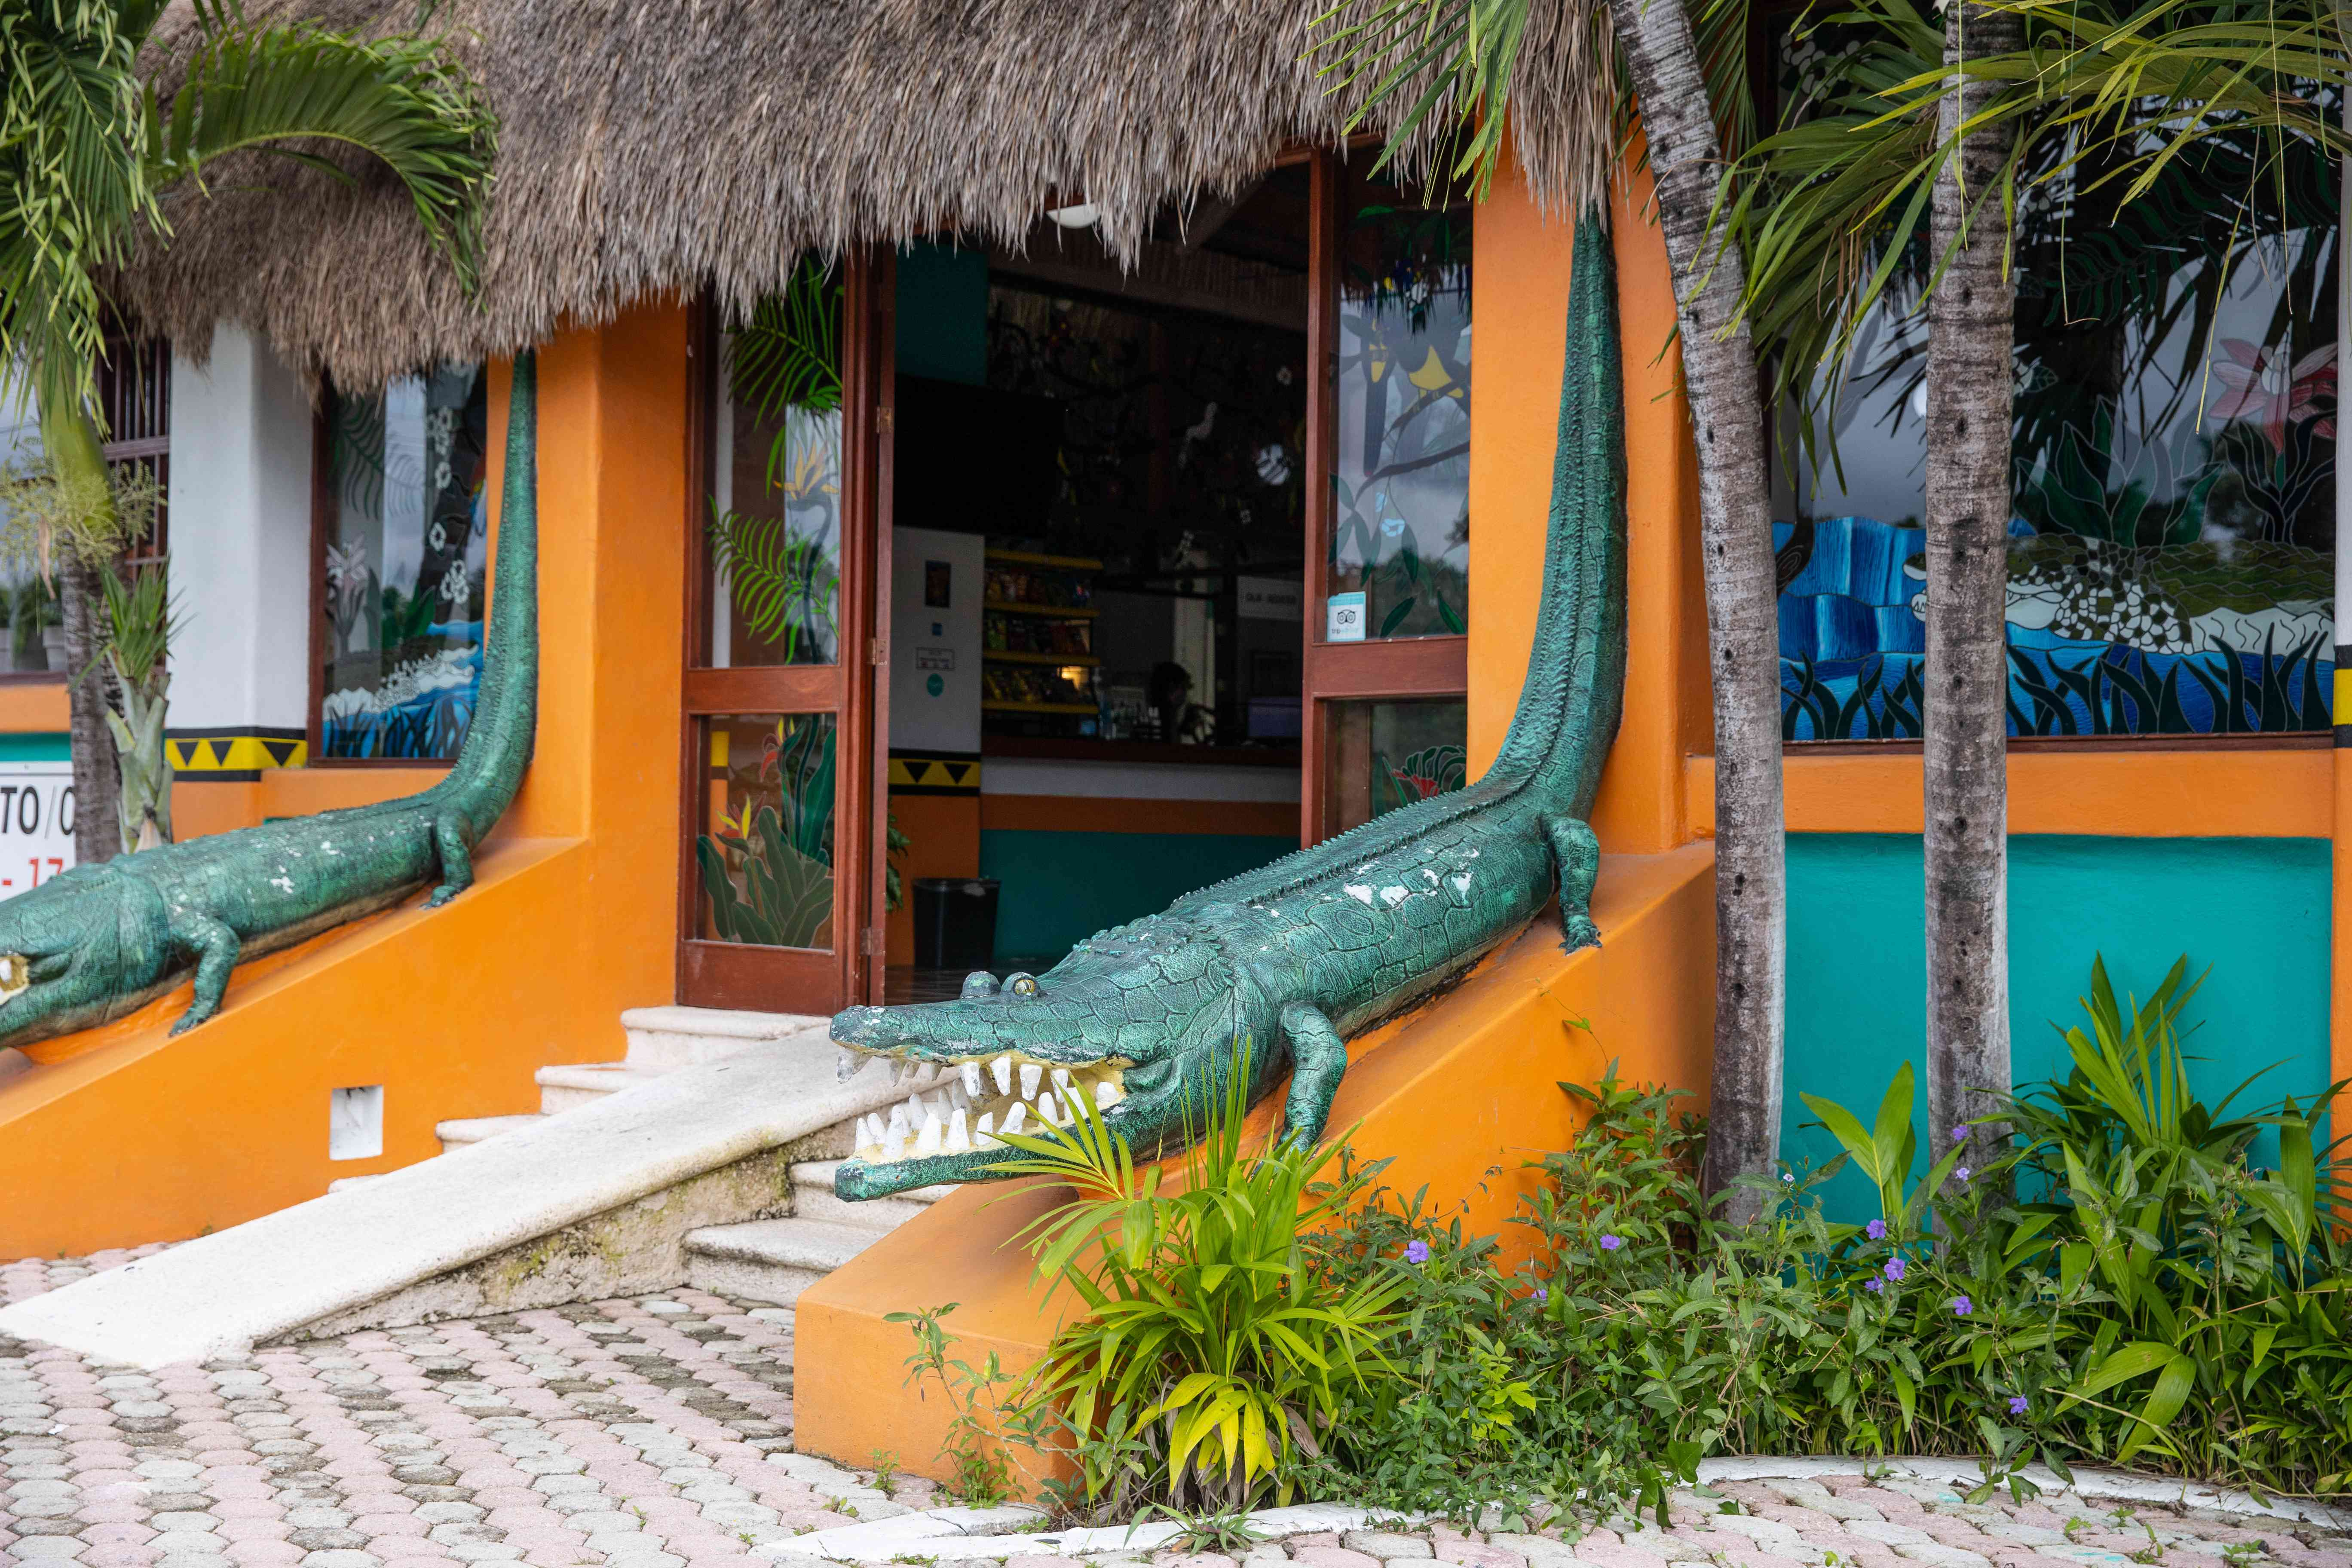 Alligator statues at Croco Cun Zoo